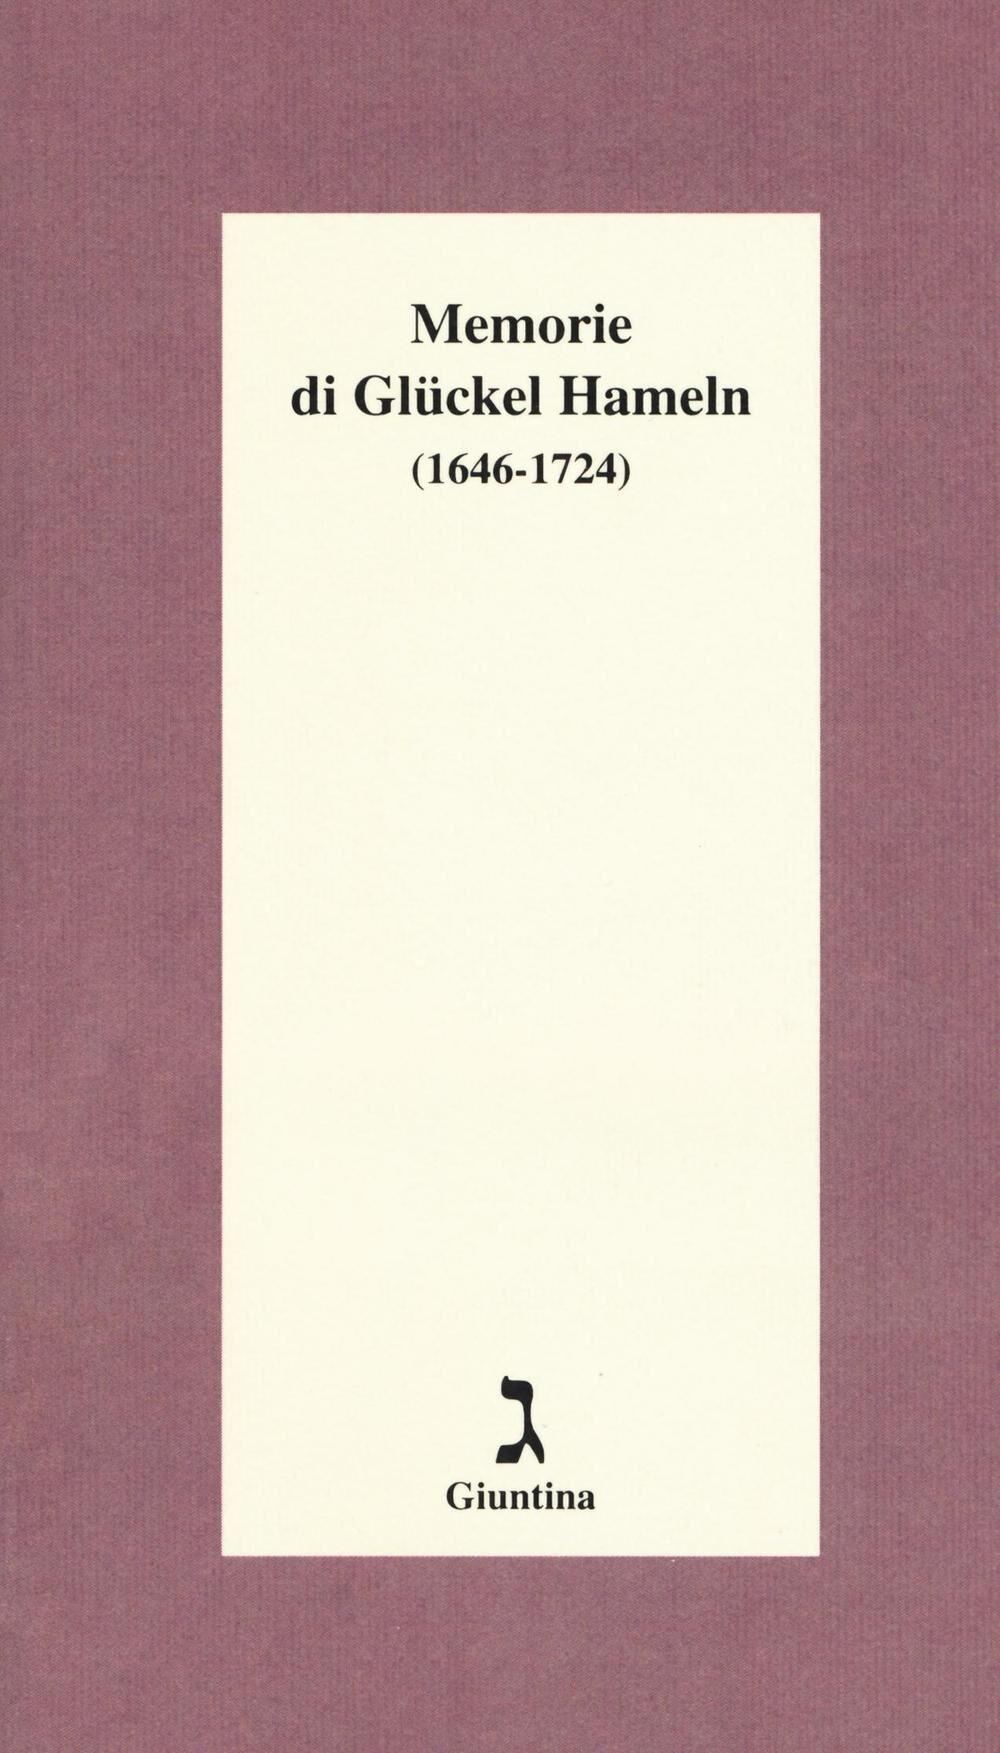 Memorie di Glückel Hameln (1646-1724)